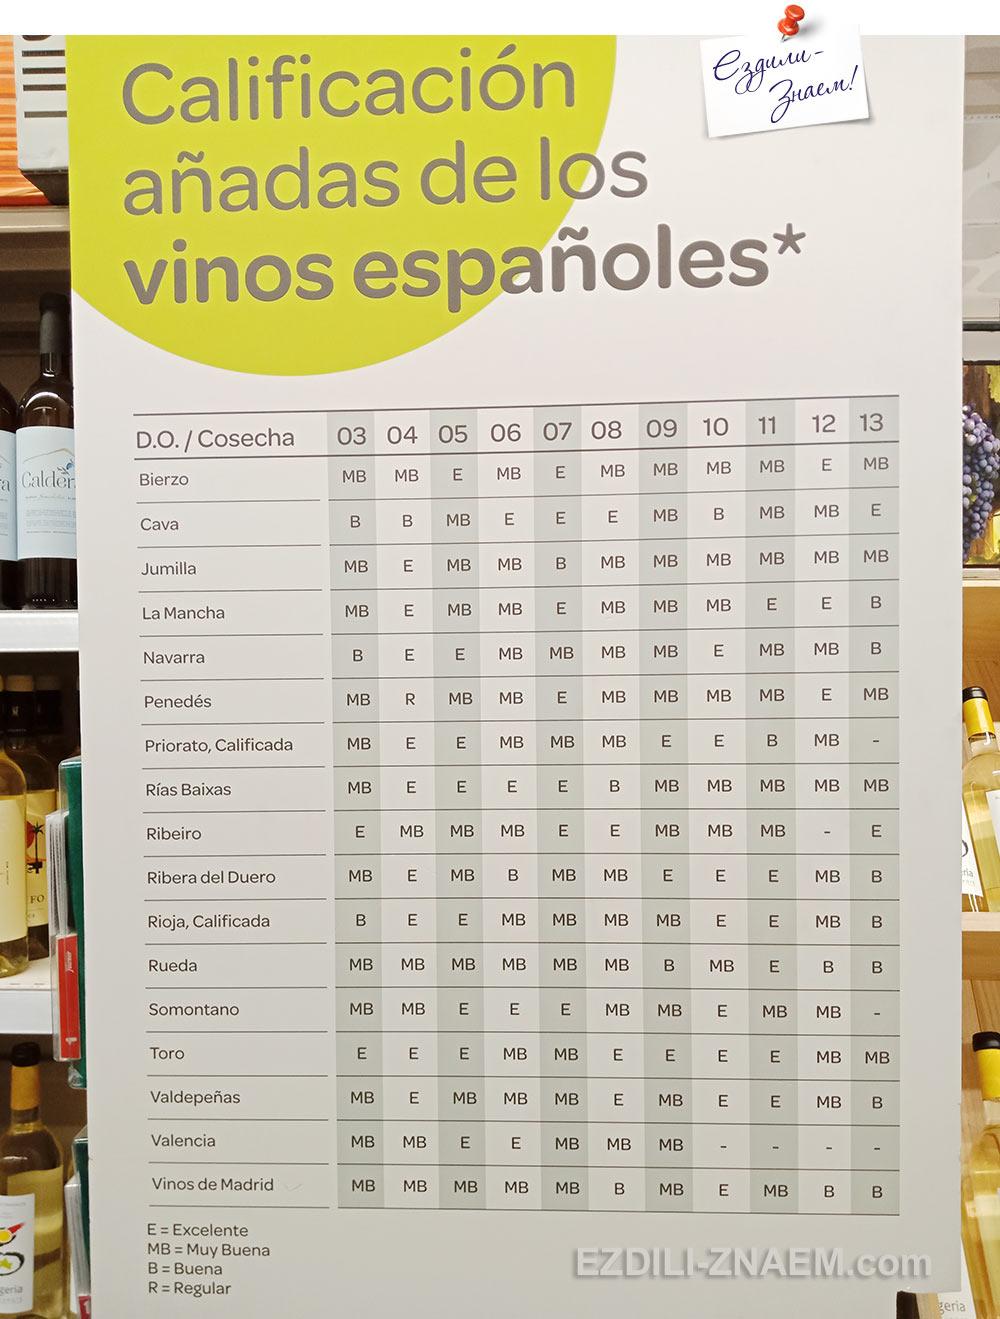 На фото: таблица урожаев вин в испанском супермаркете